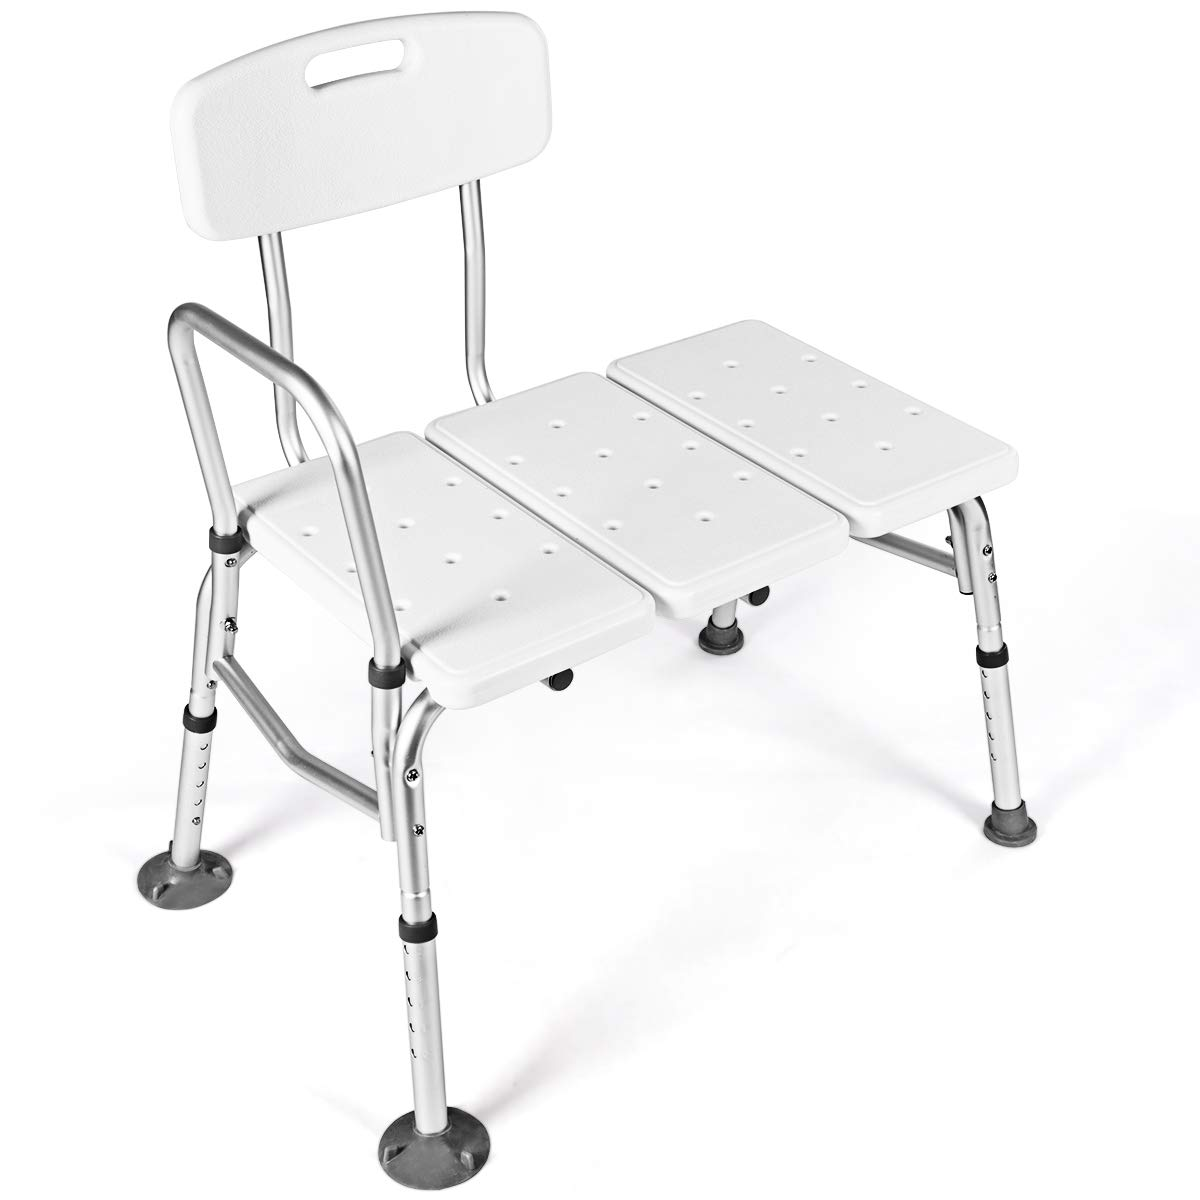 Giantex Tub Transfer Bench for Elderly W/Adjustable Arm,Back and Leg Height for Medical Bathroom Bathtub Stool Chair Shower Seat Bench